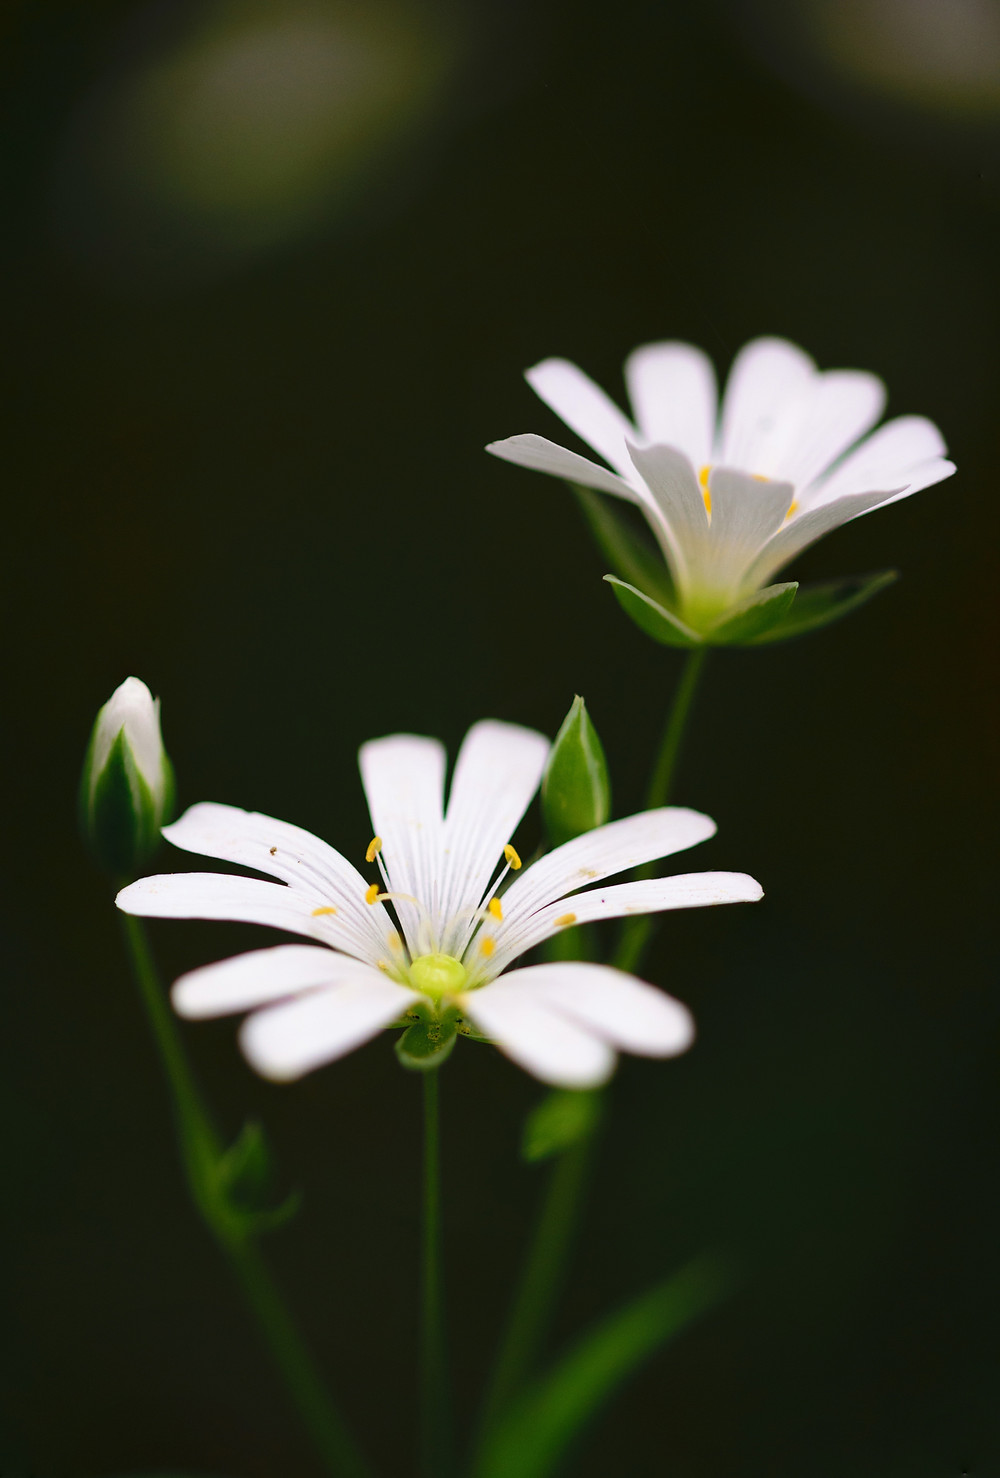 a white flower symbolizing virginity.